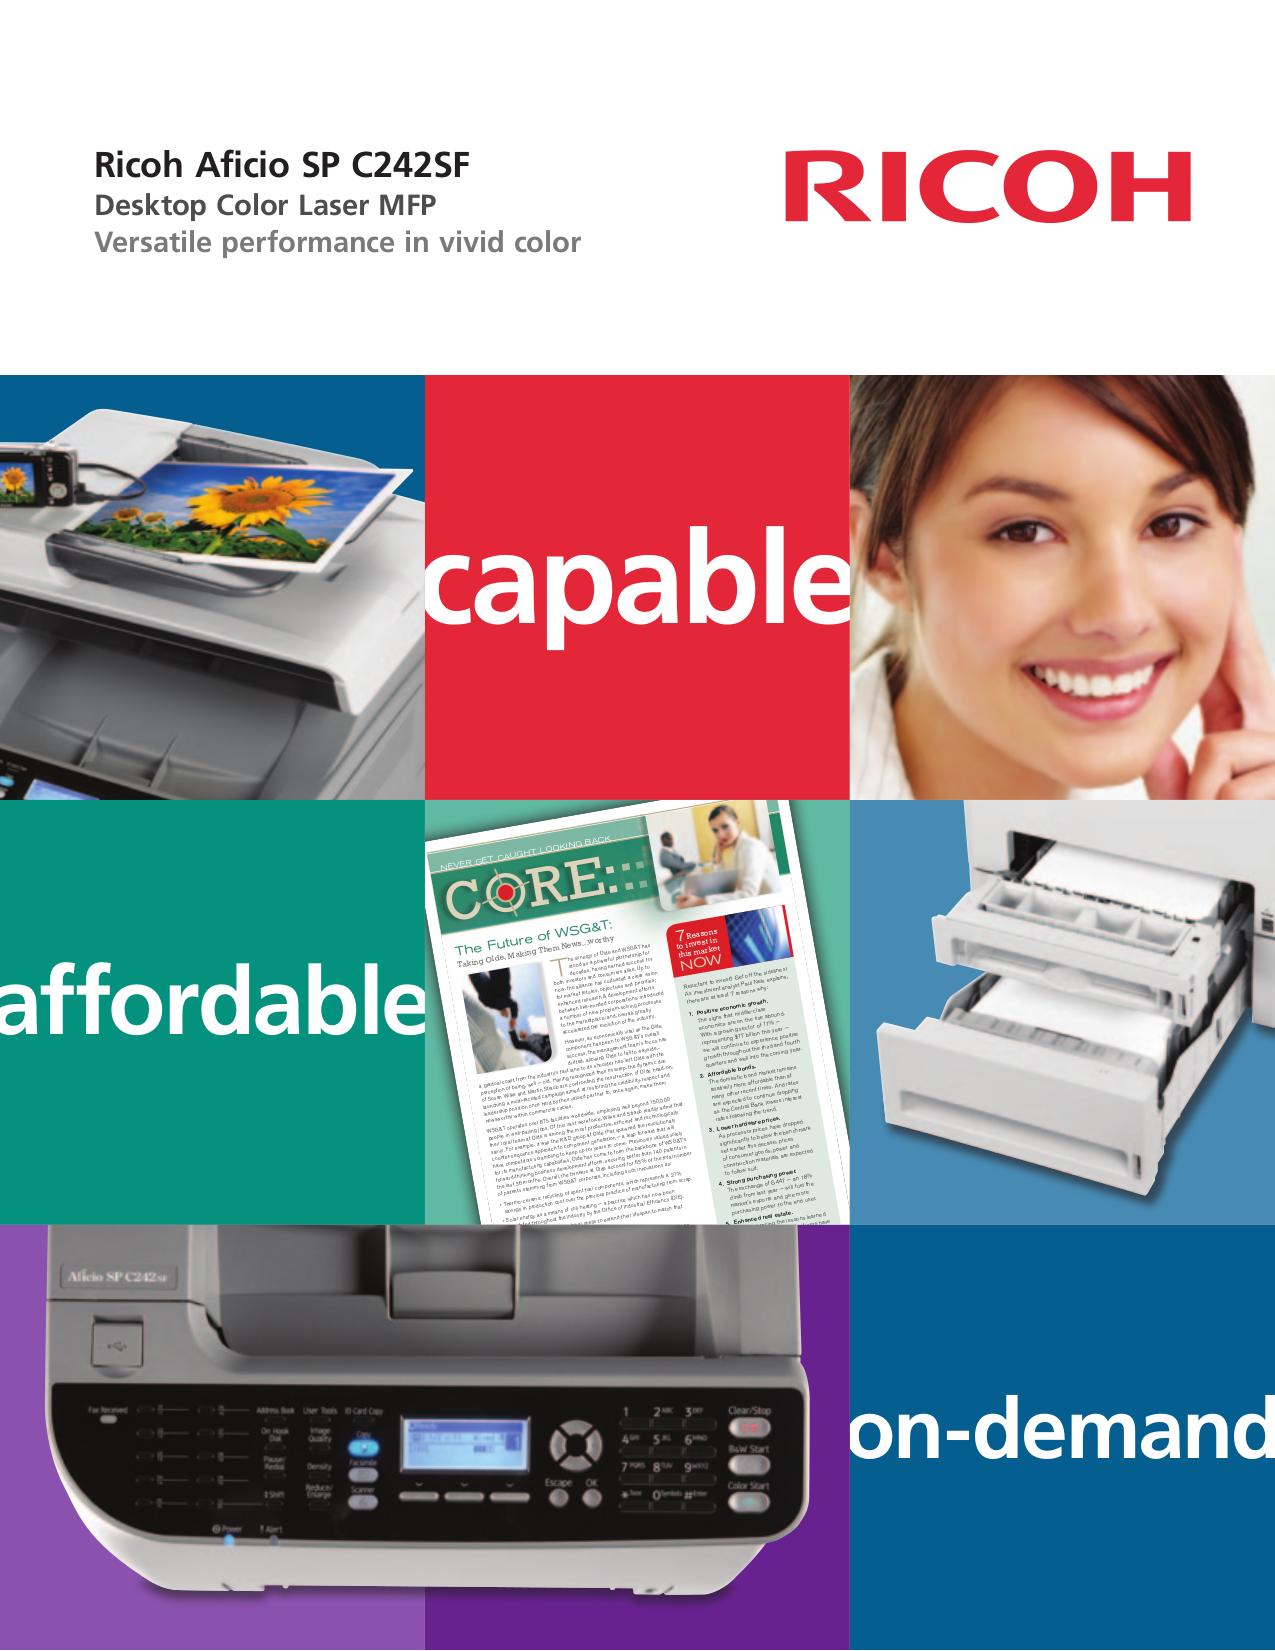 pdf for Ricoh Multifunction Printer Aficio SP C242SF manual